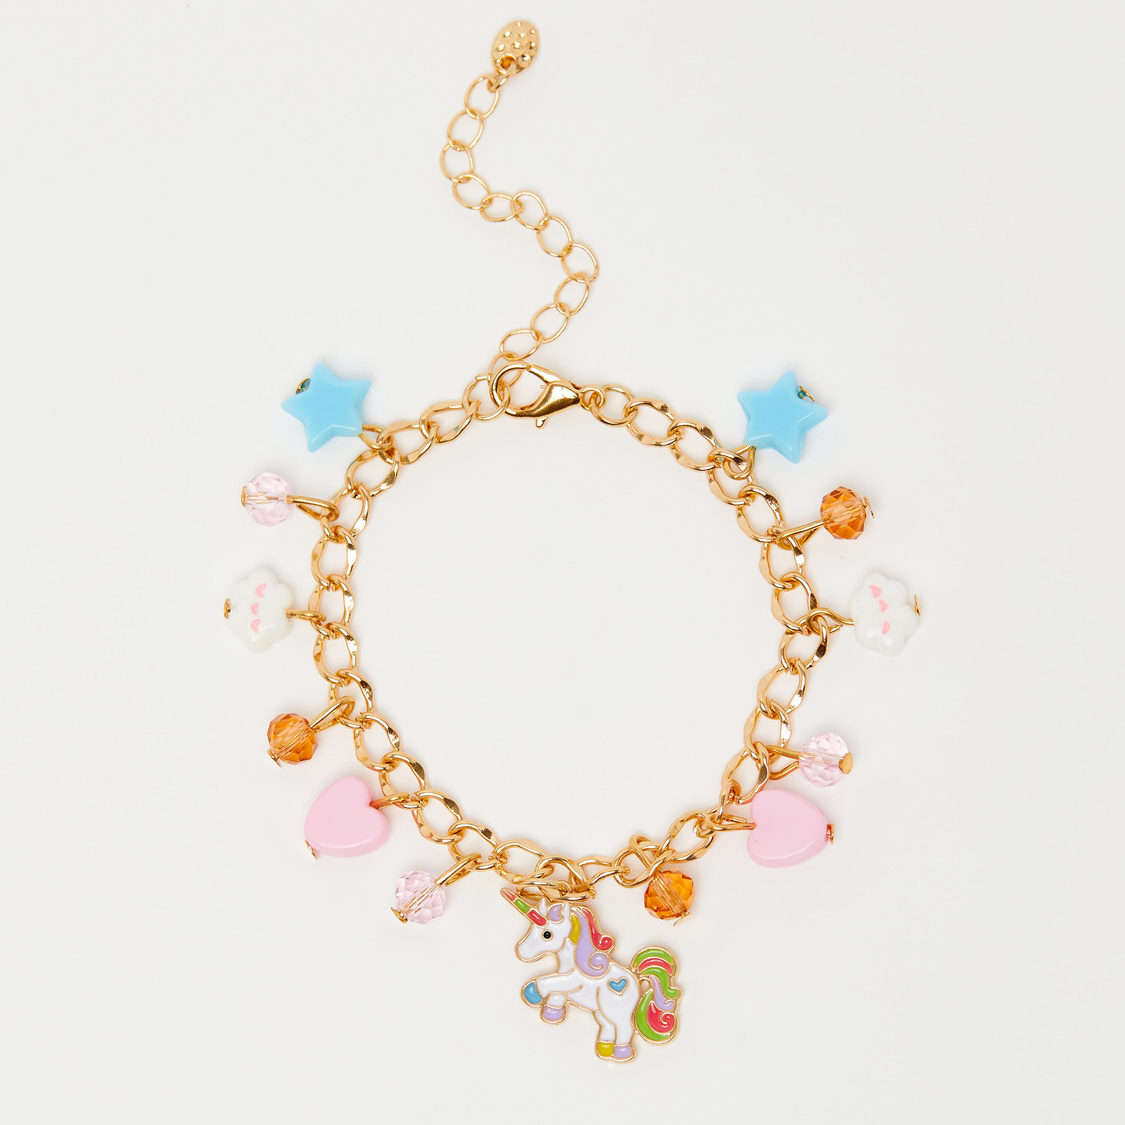 Embellished Charm Bracelet with Lobster Clasp